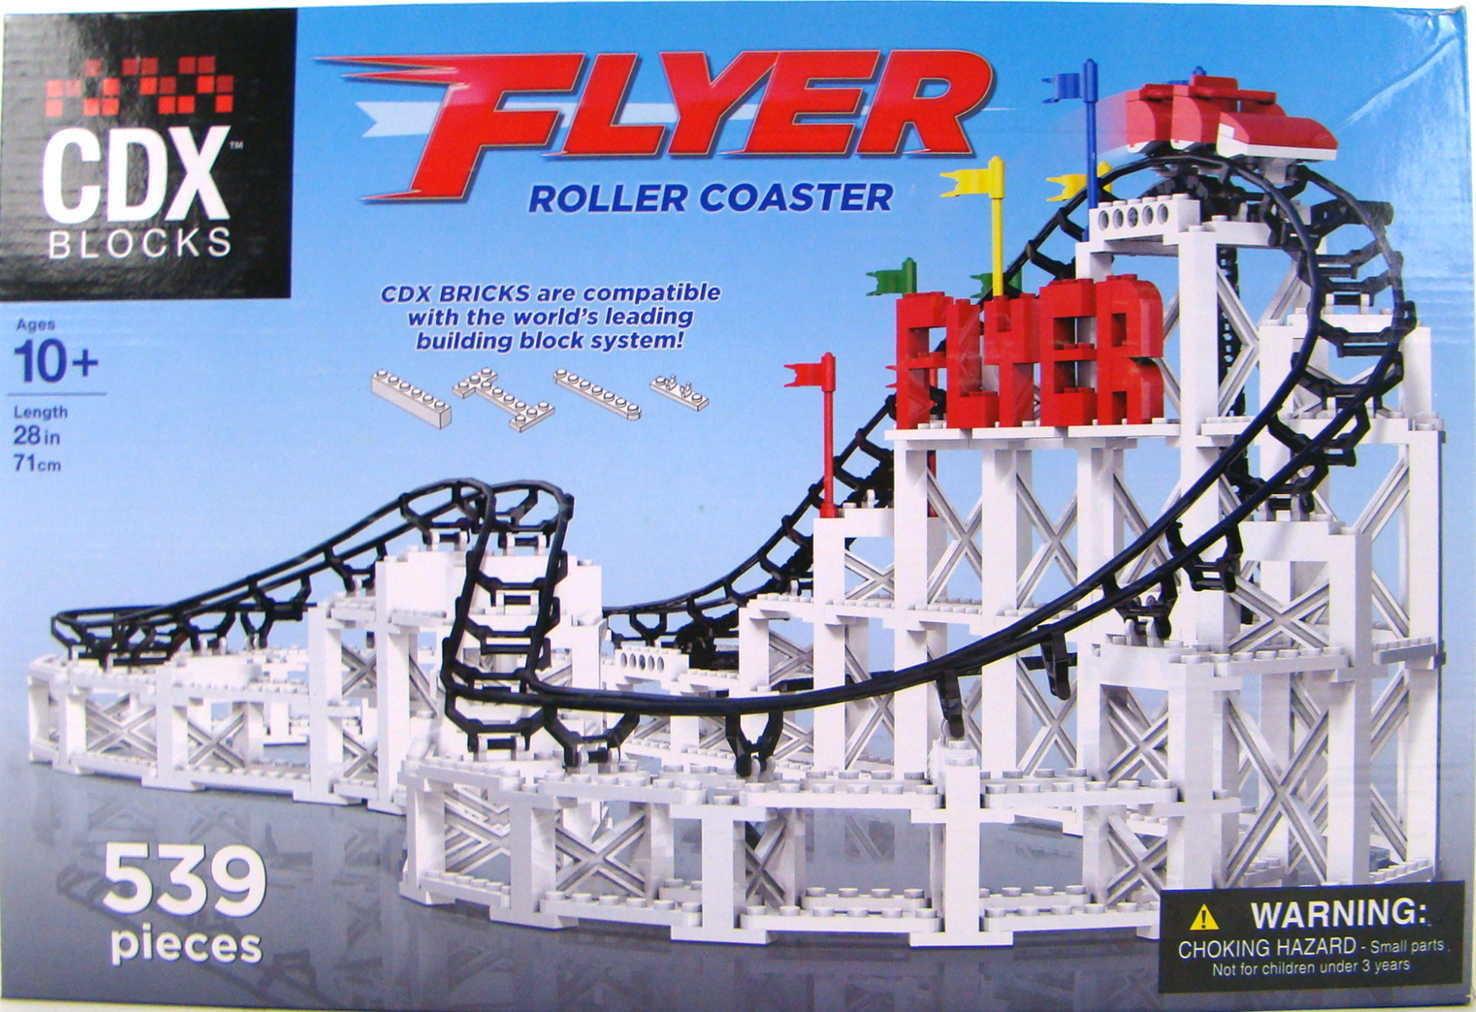 Coaster Dynamix Lego®-Compatible CDX Block